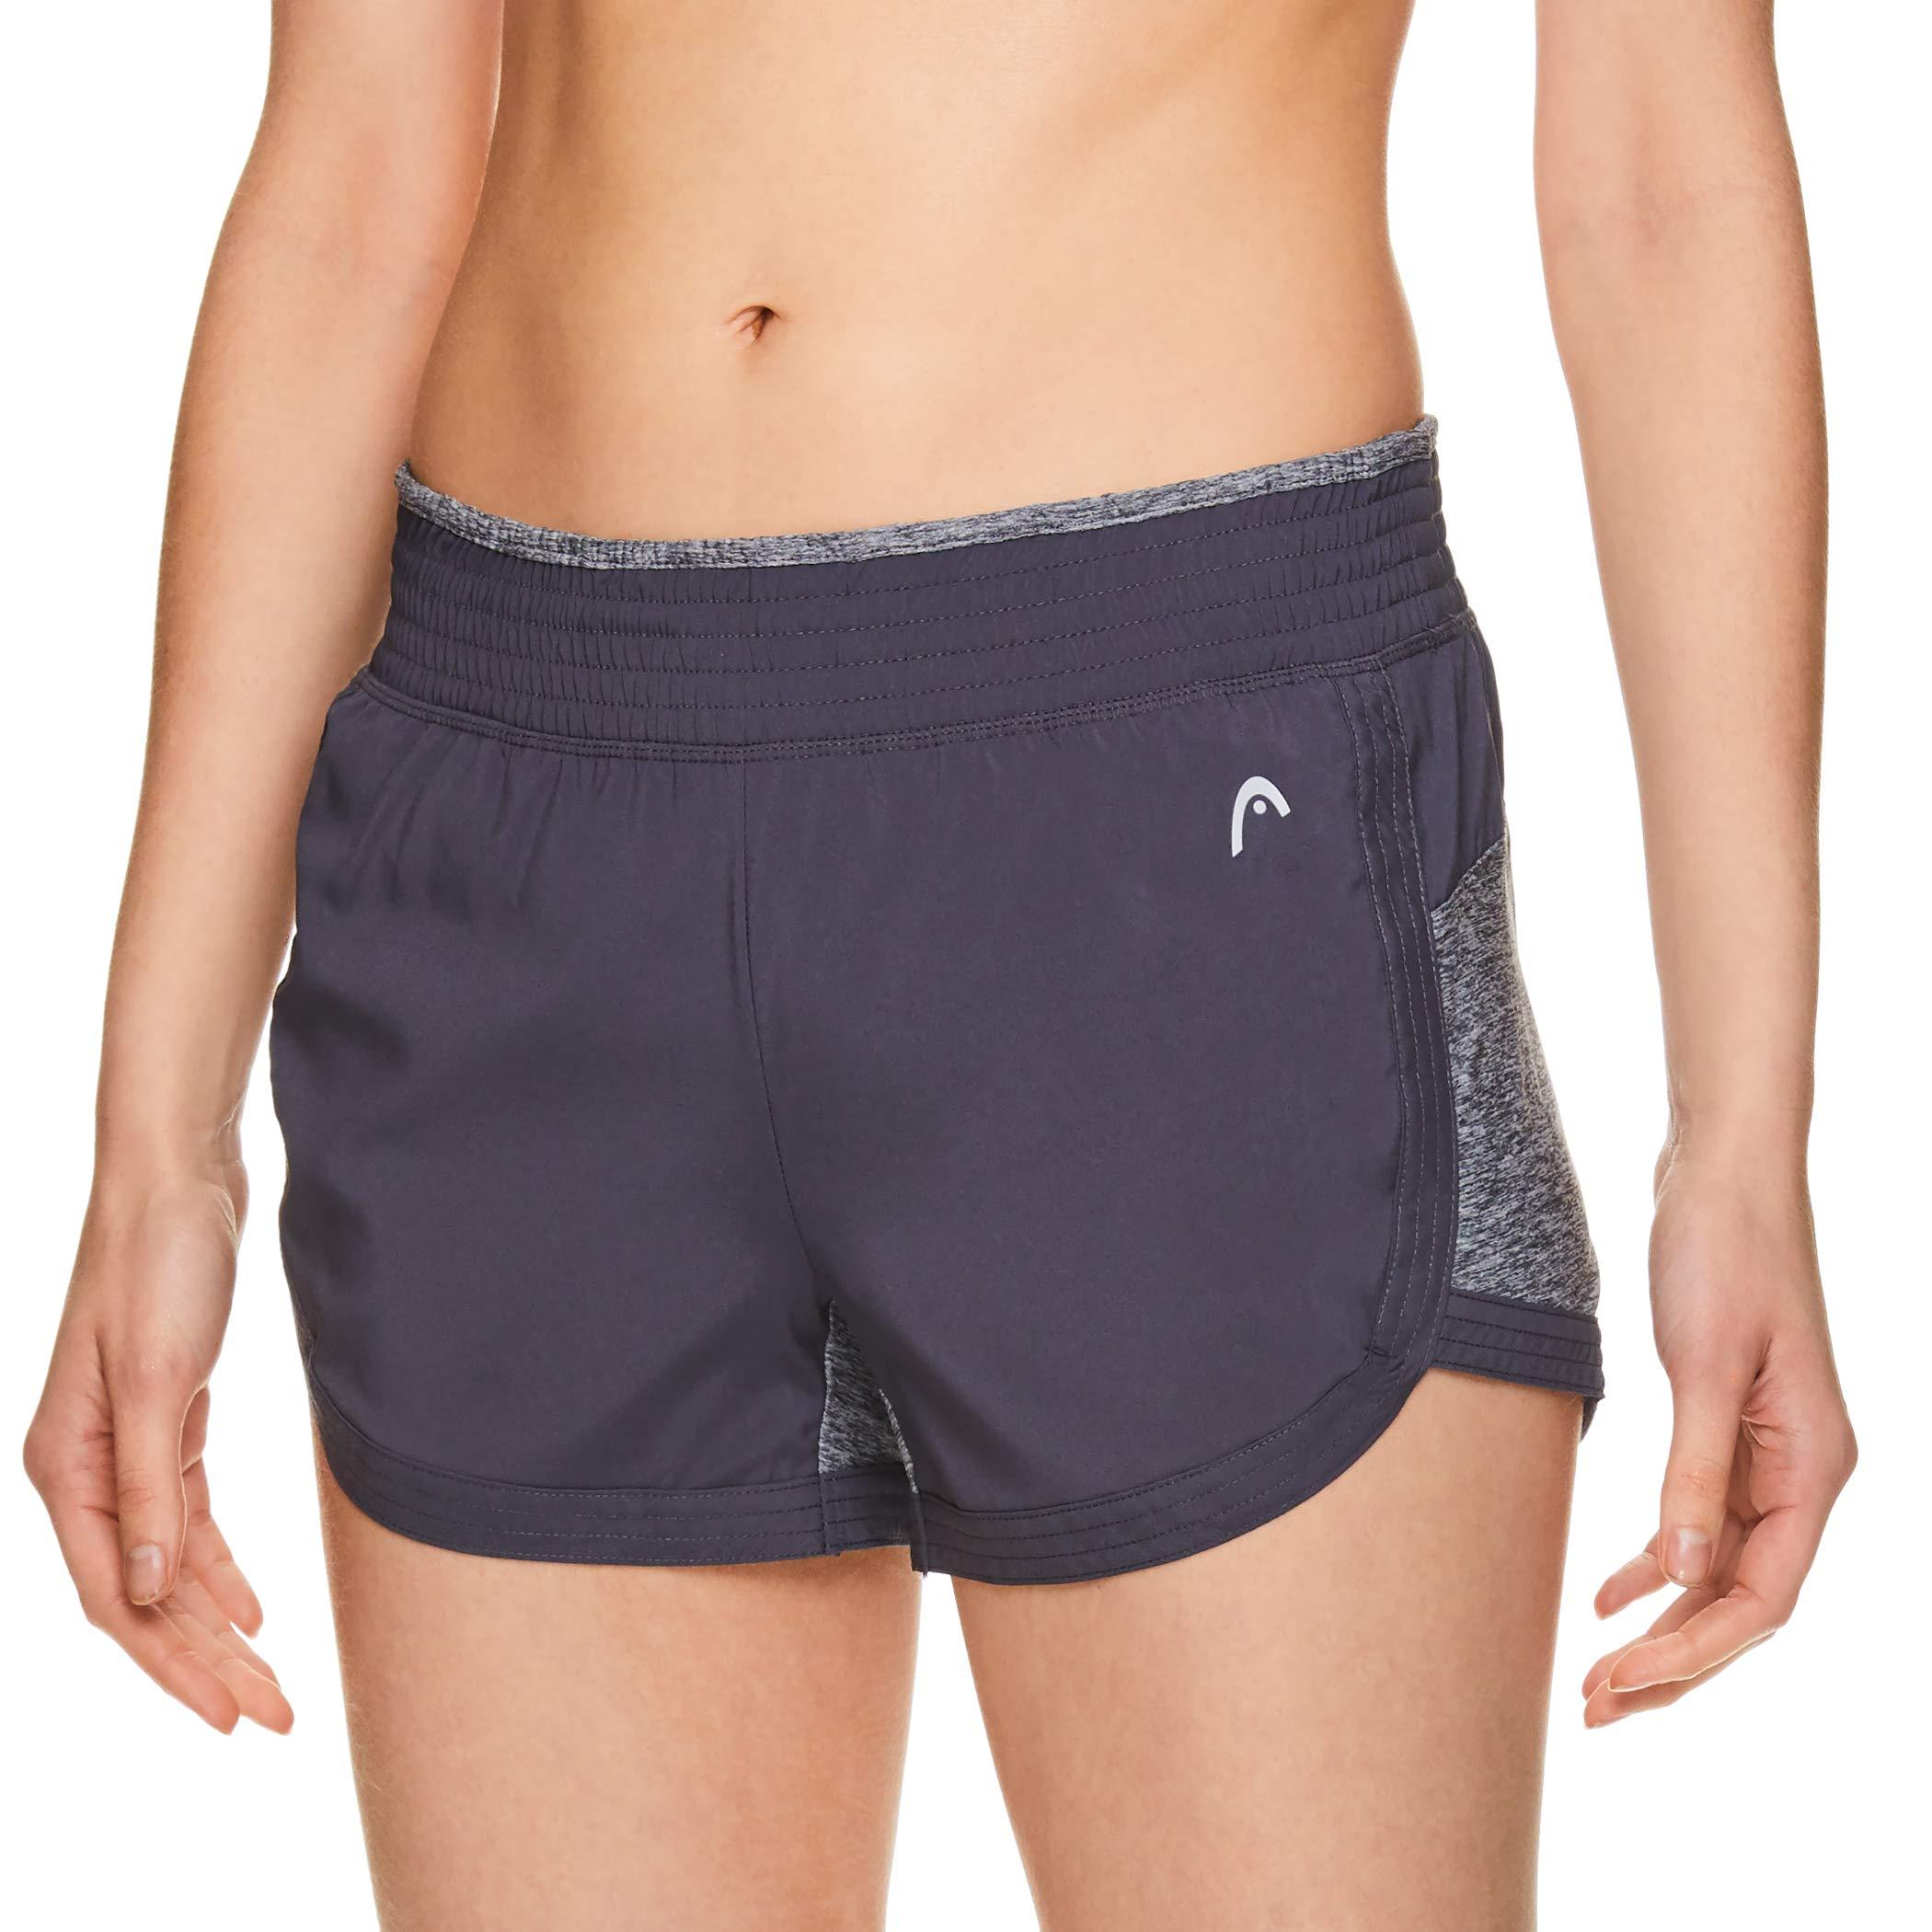 HEAD Women's Athletic Workout Shorts - Polyester Gym Training & Running Short - Medium Grey Half Mile Short, X-Small